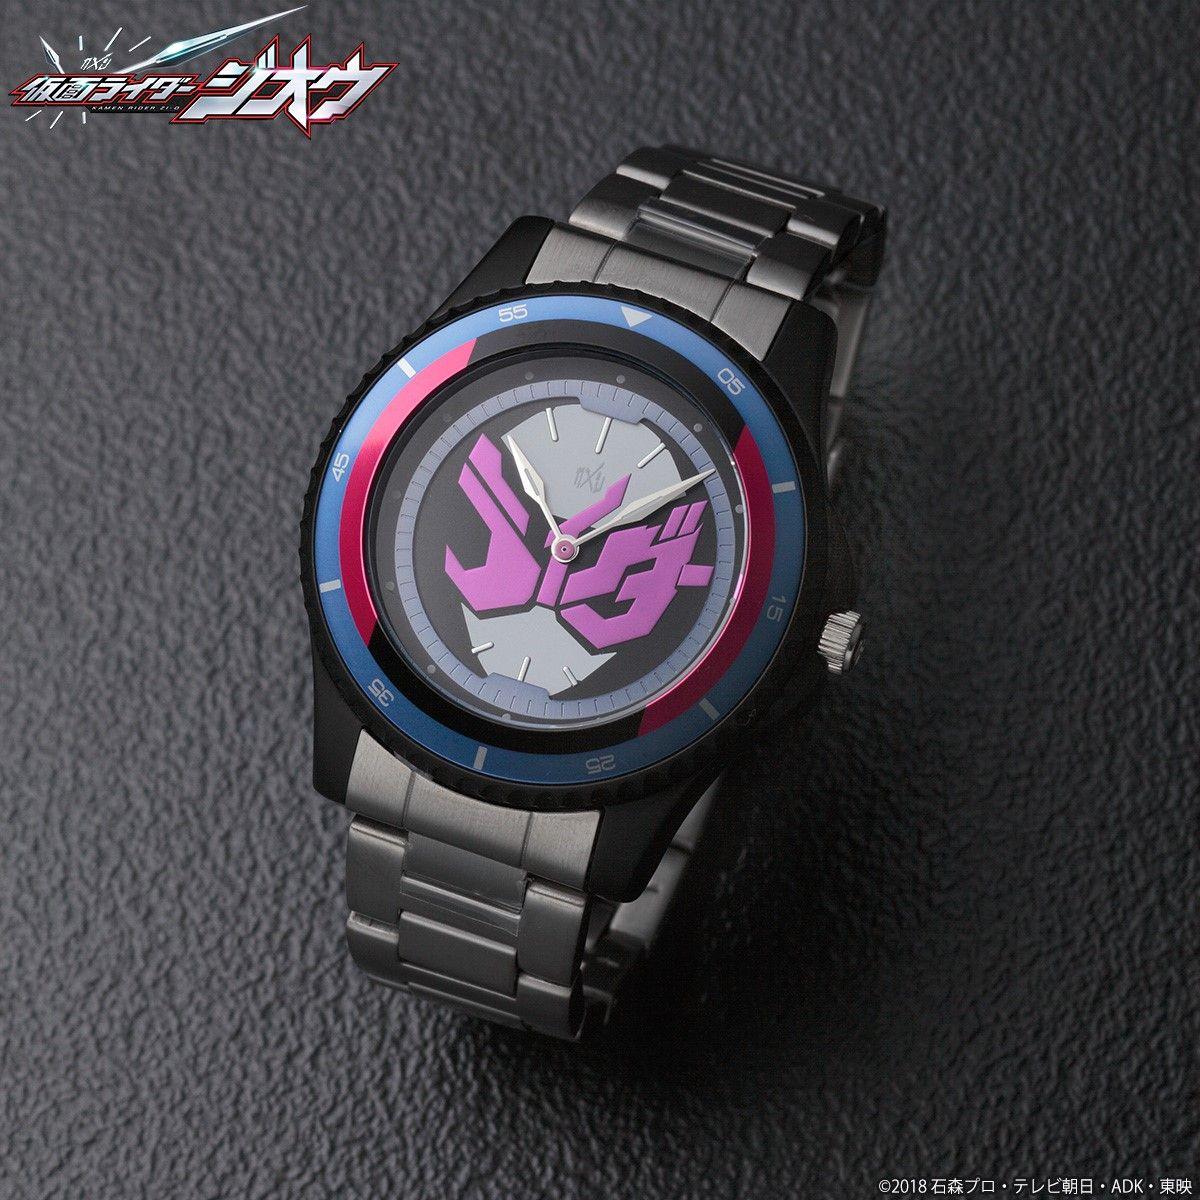 Live Action Watc『ジオウ』仮面ライダージオウ 腕時計-001